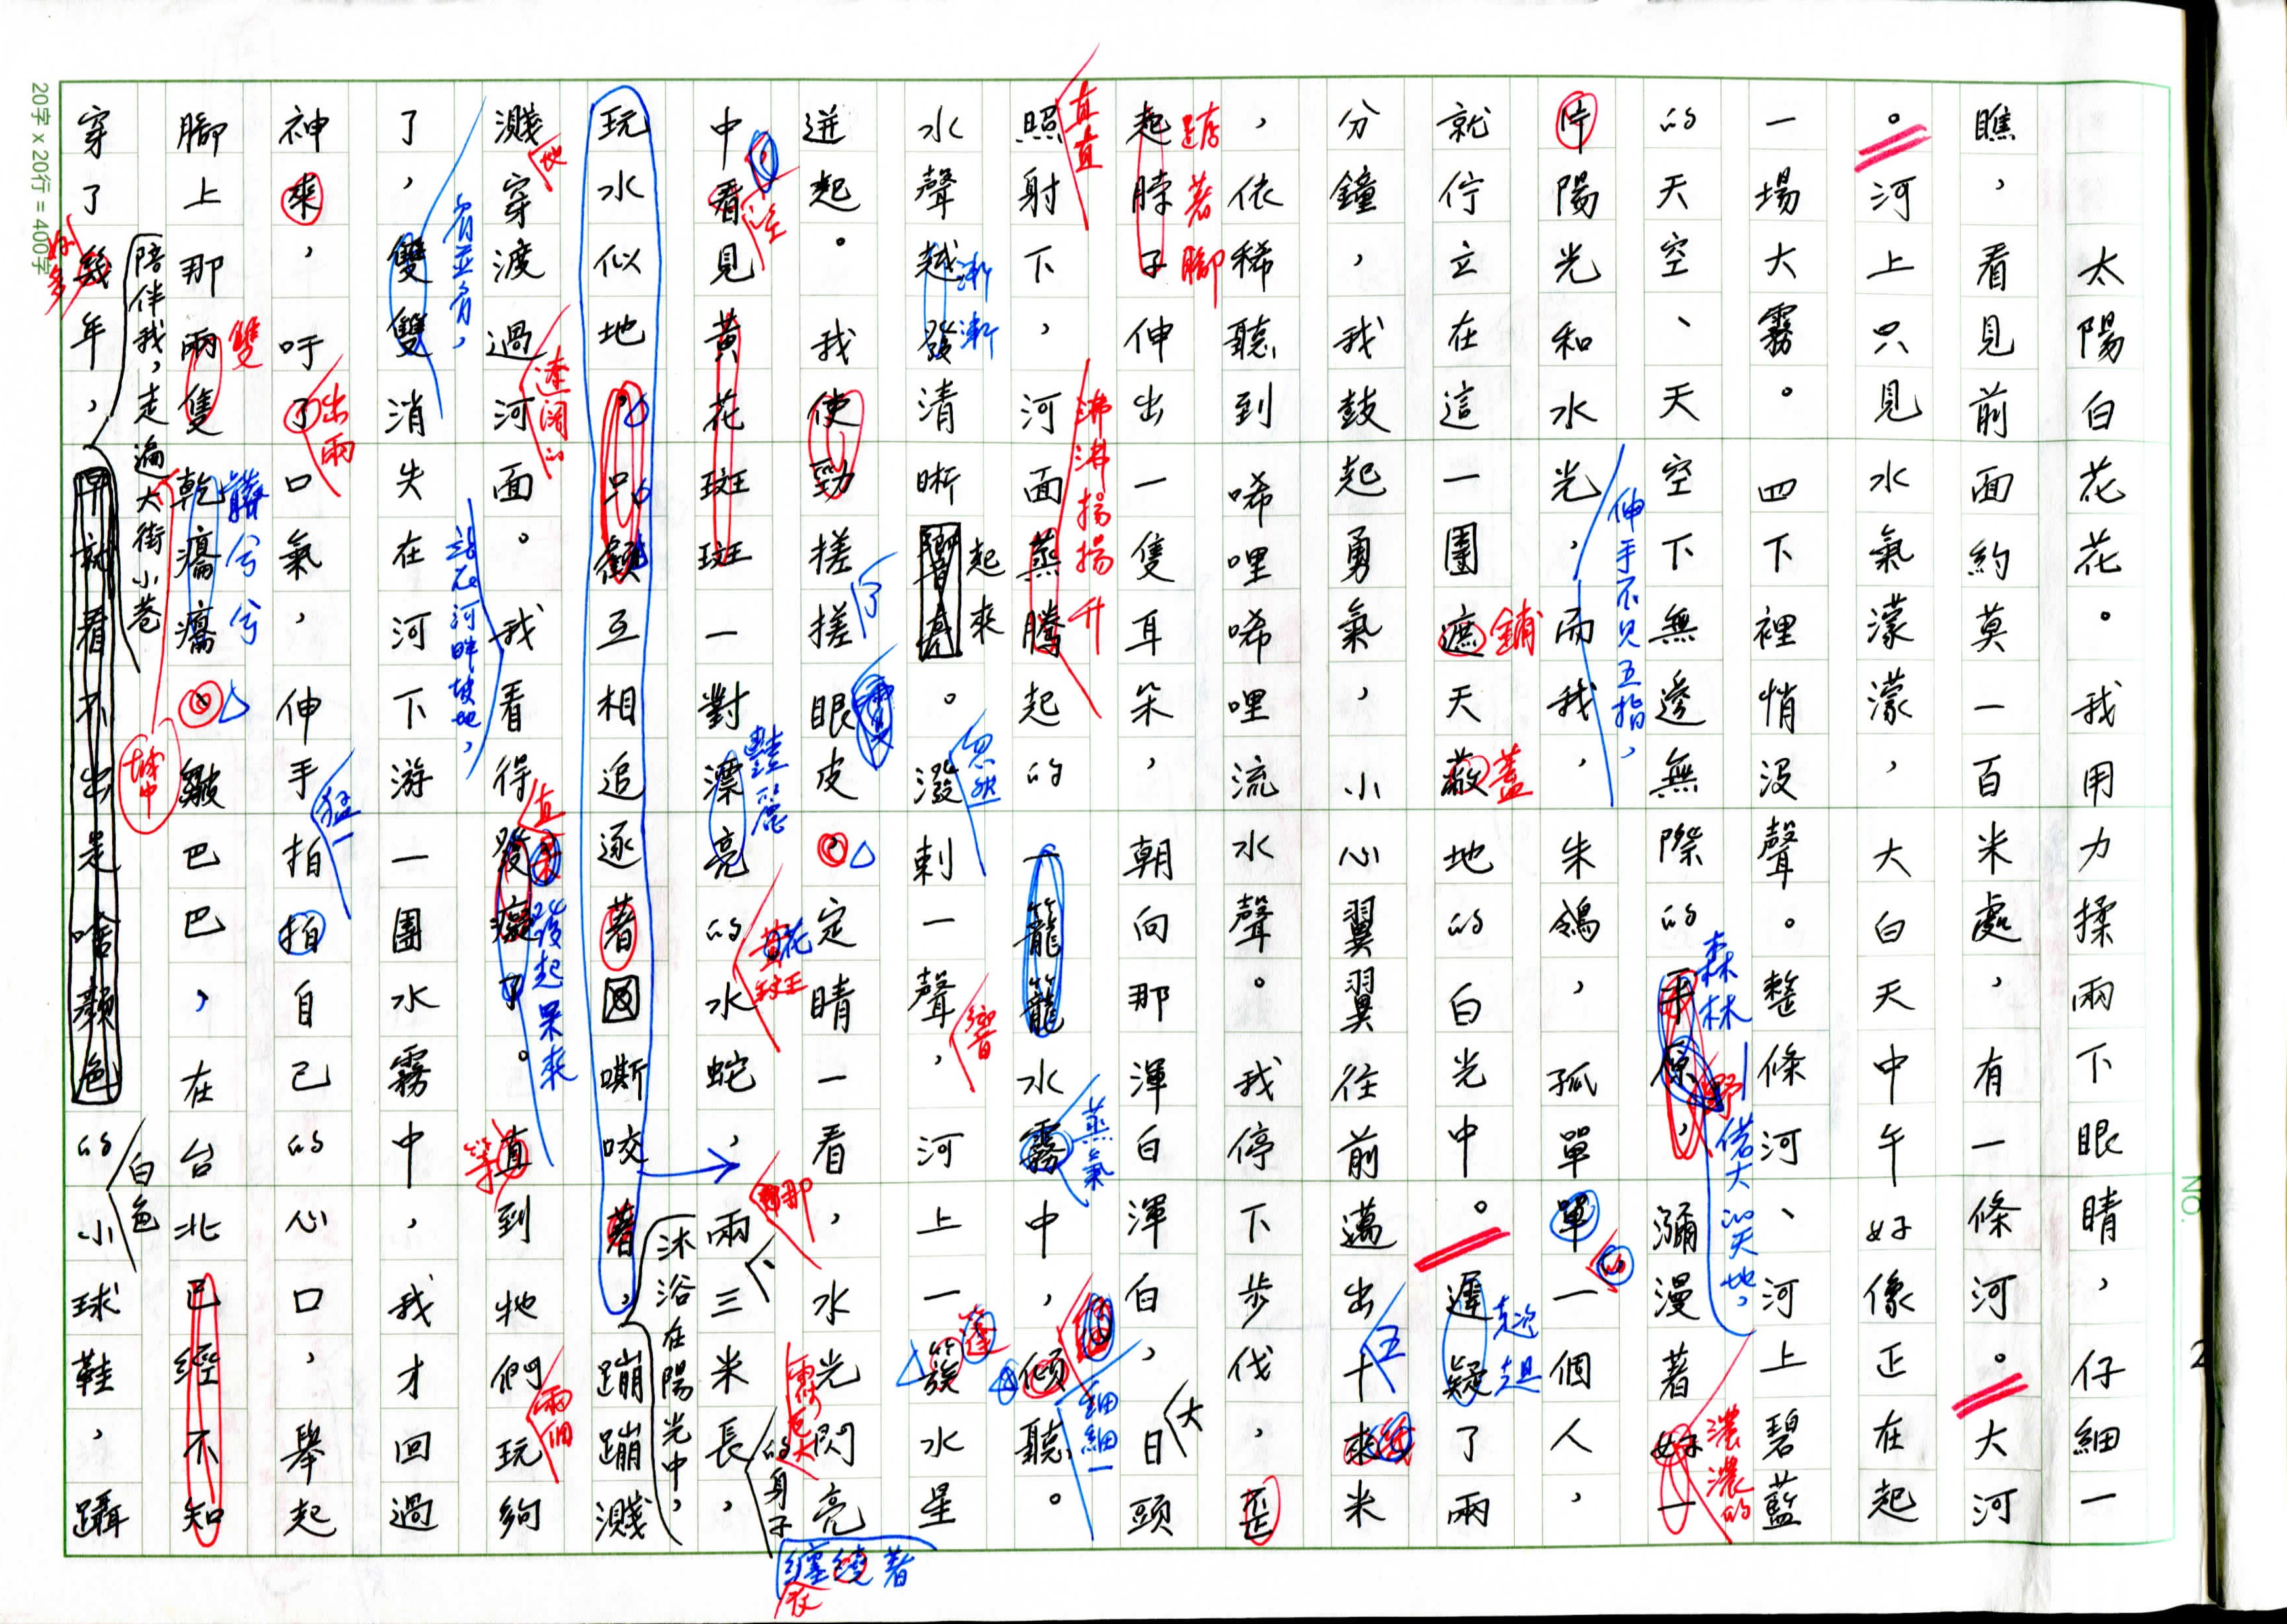 The Book of Zhu Ling Provided by Li Yongping